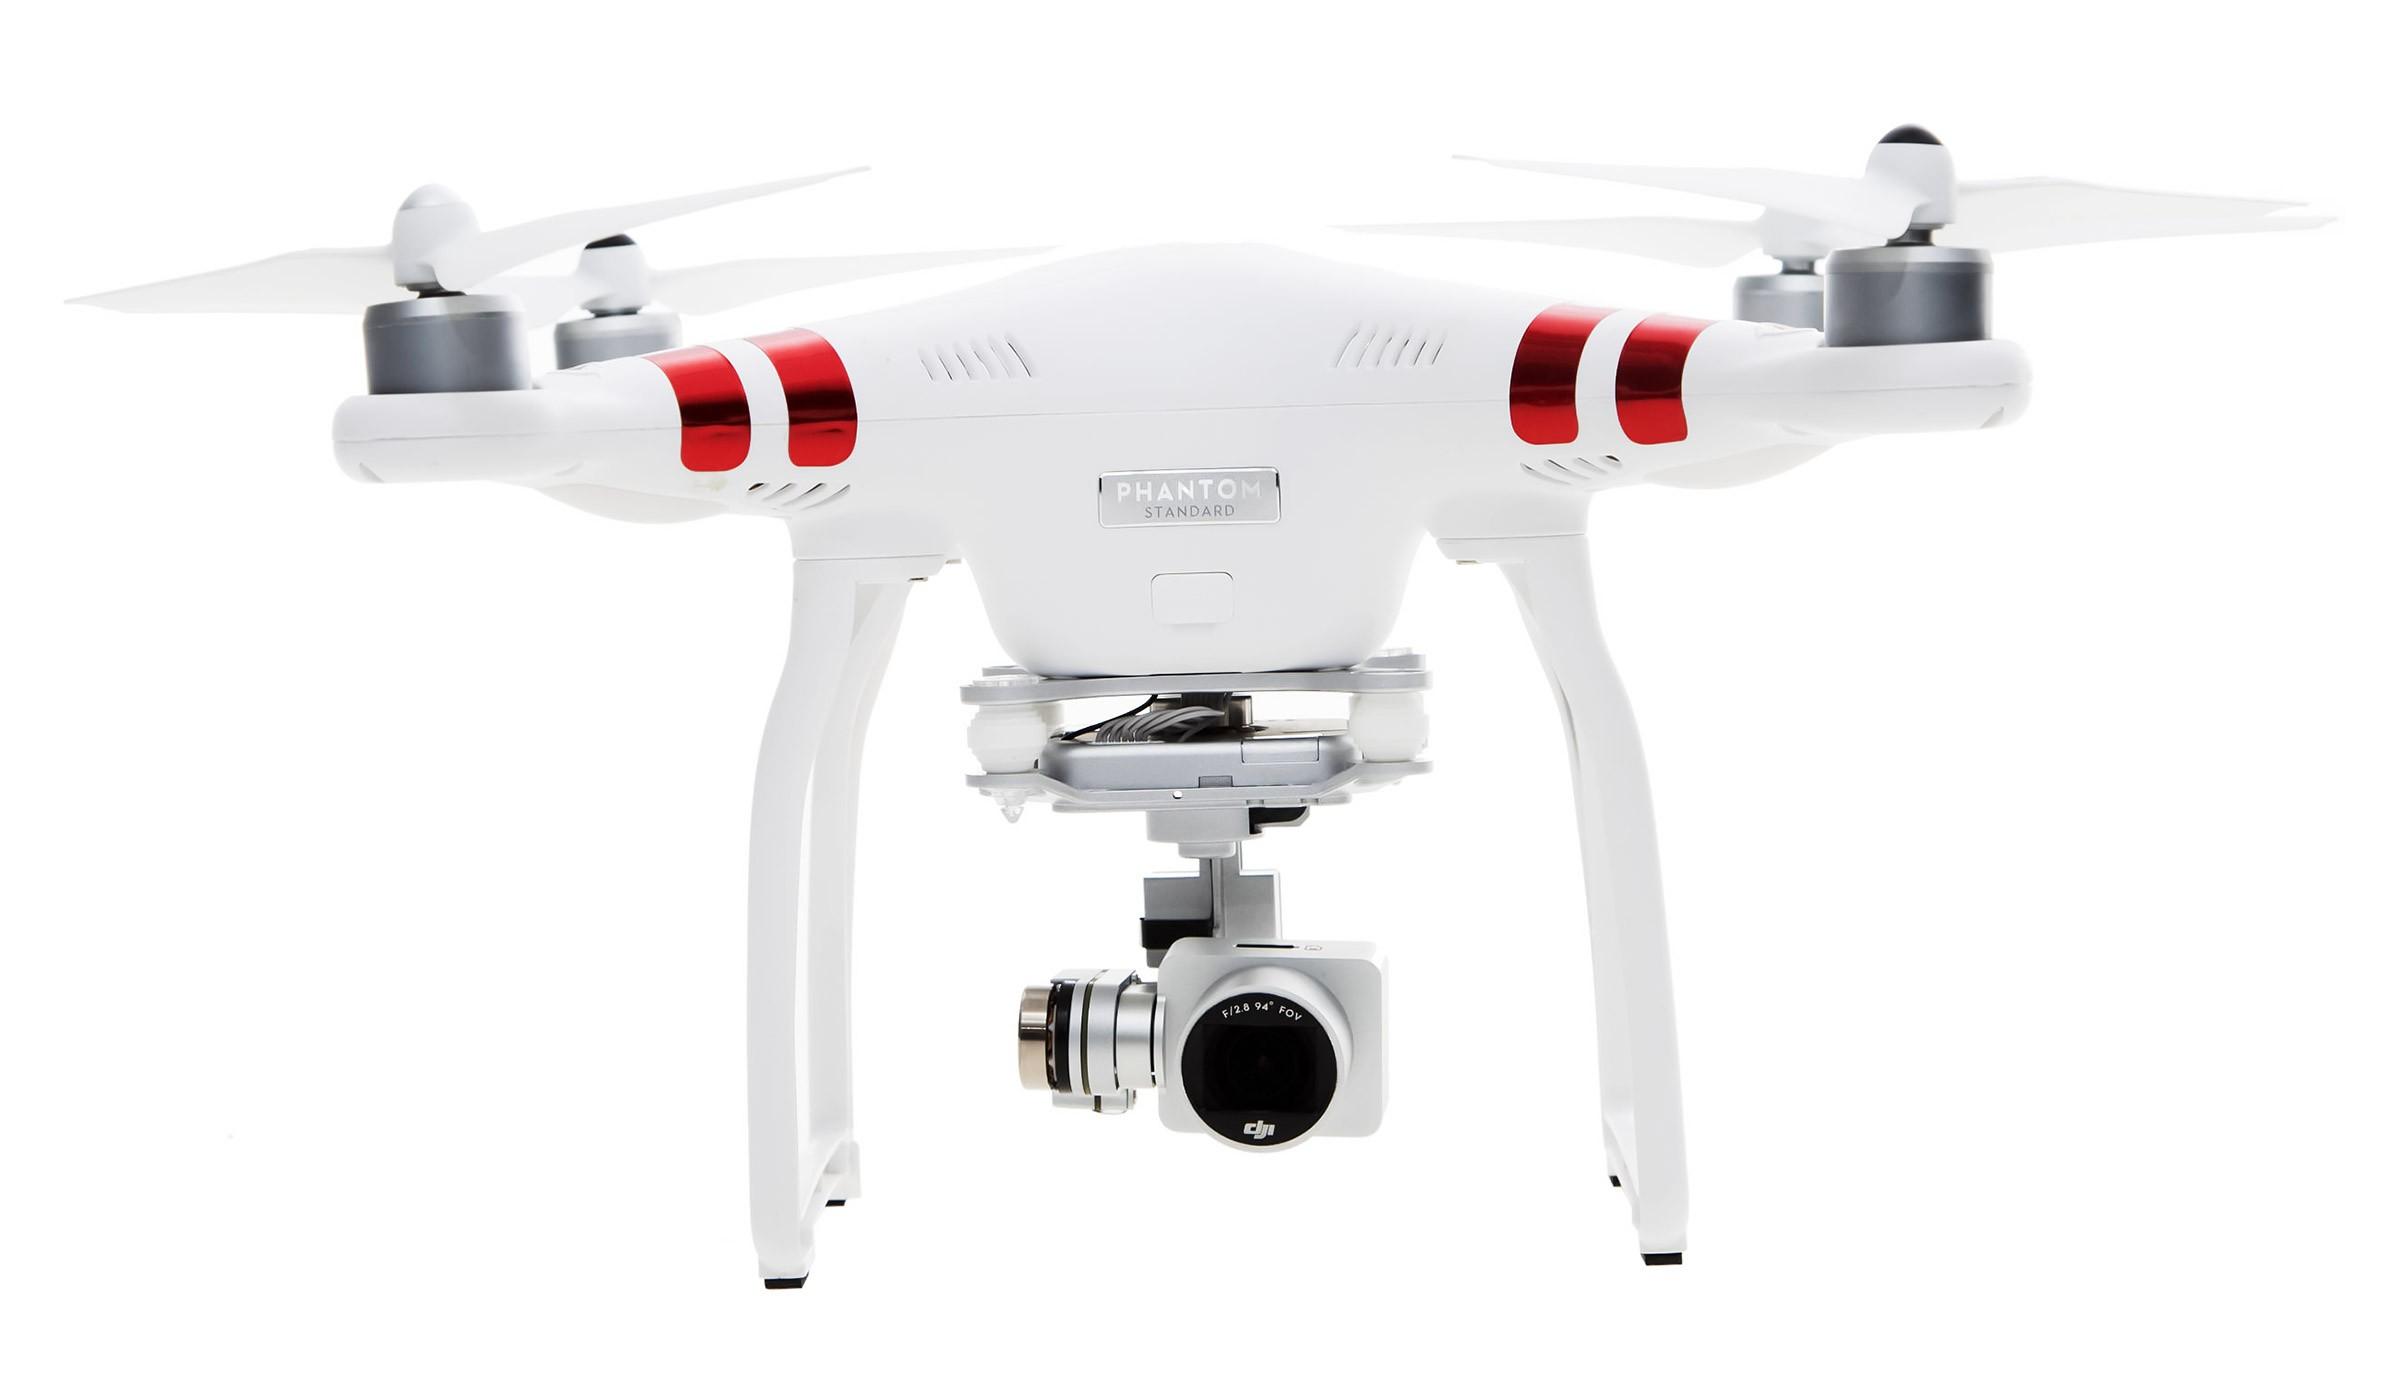 drone dji phantom 3 standard droni. Black Bedroom Furniture Sets. Home Design Ideas